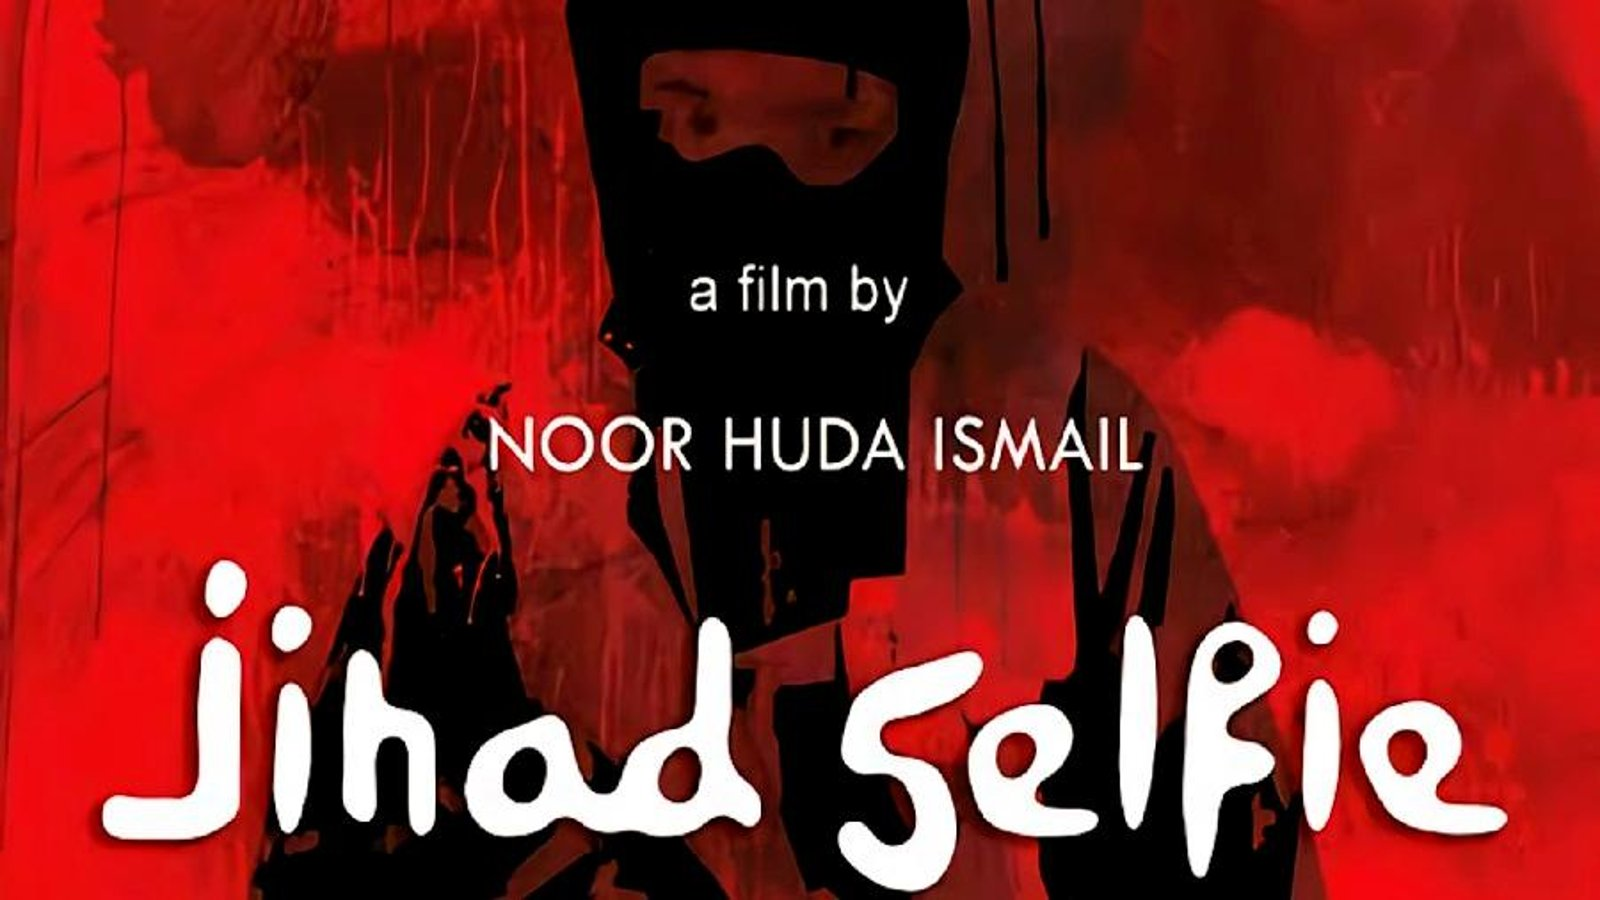 Jihad Selfie - ISIS Recruitment via Social Media in Indonesia